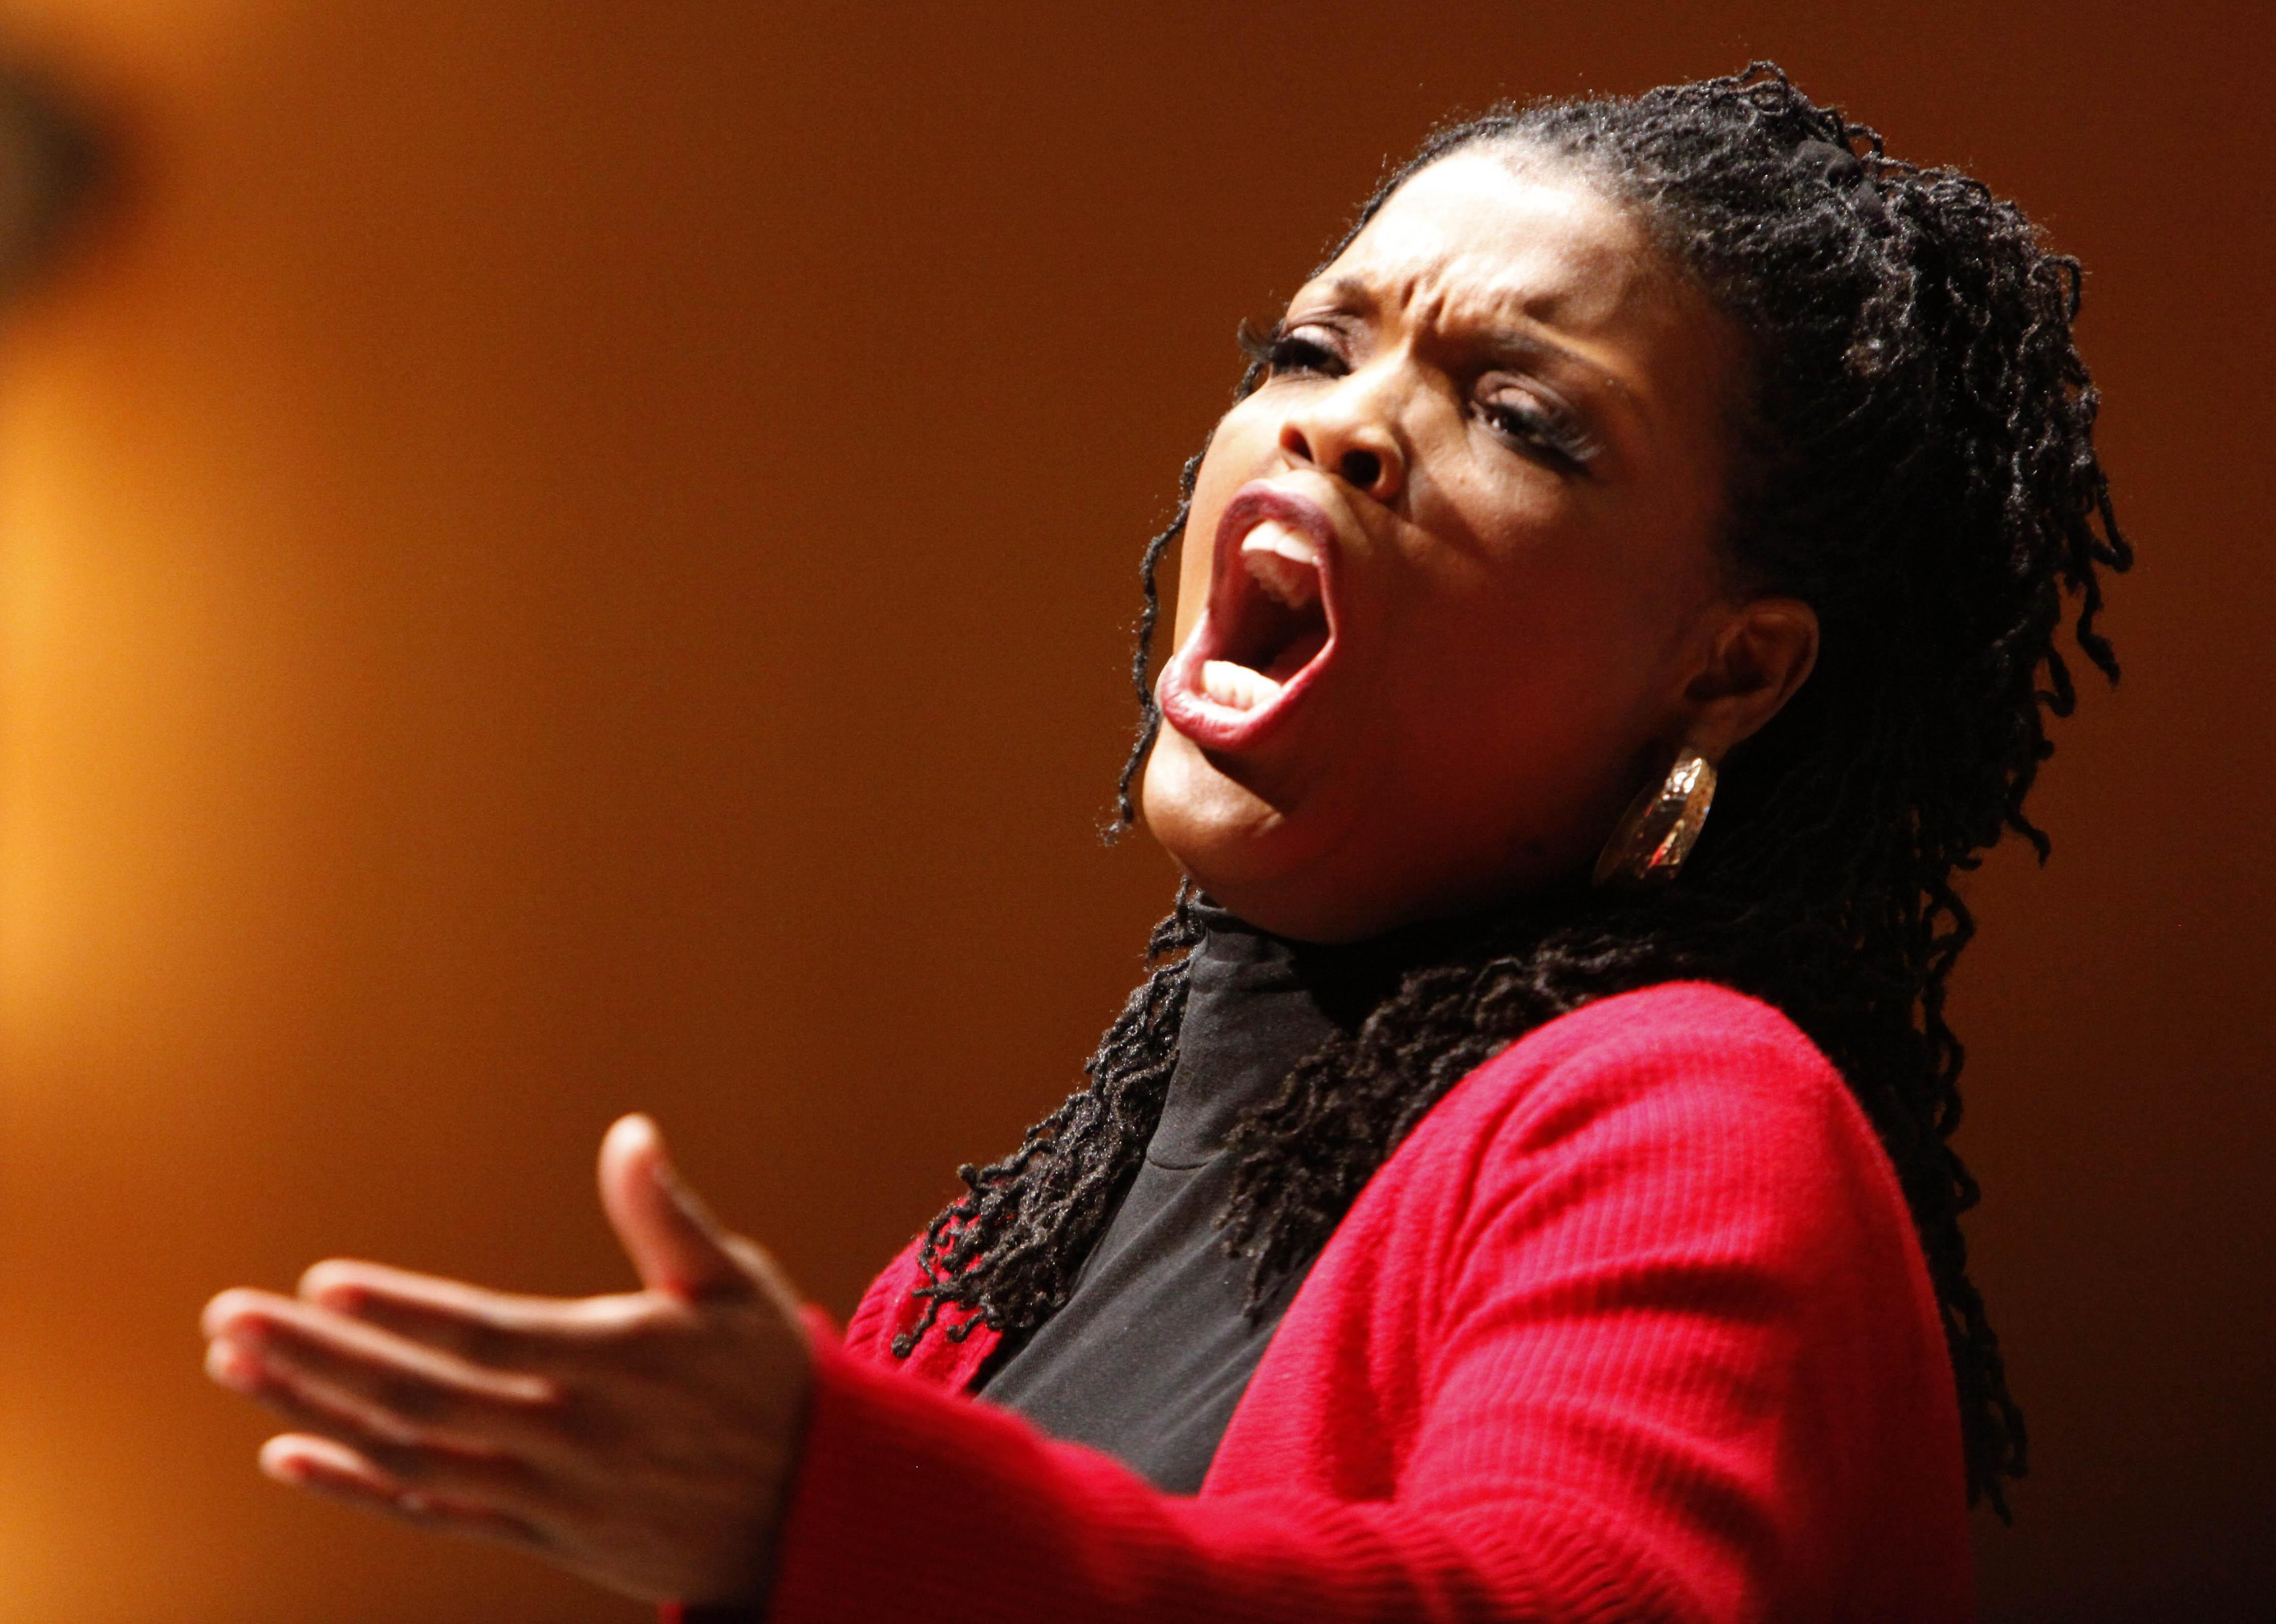 Metropolitan Opera star Angela Brown has performed before in Buffalo to audience acclaim.